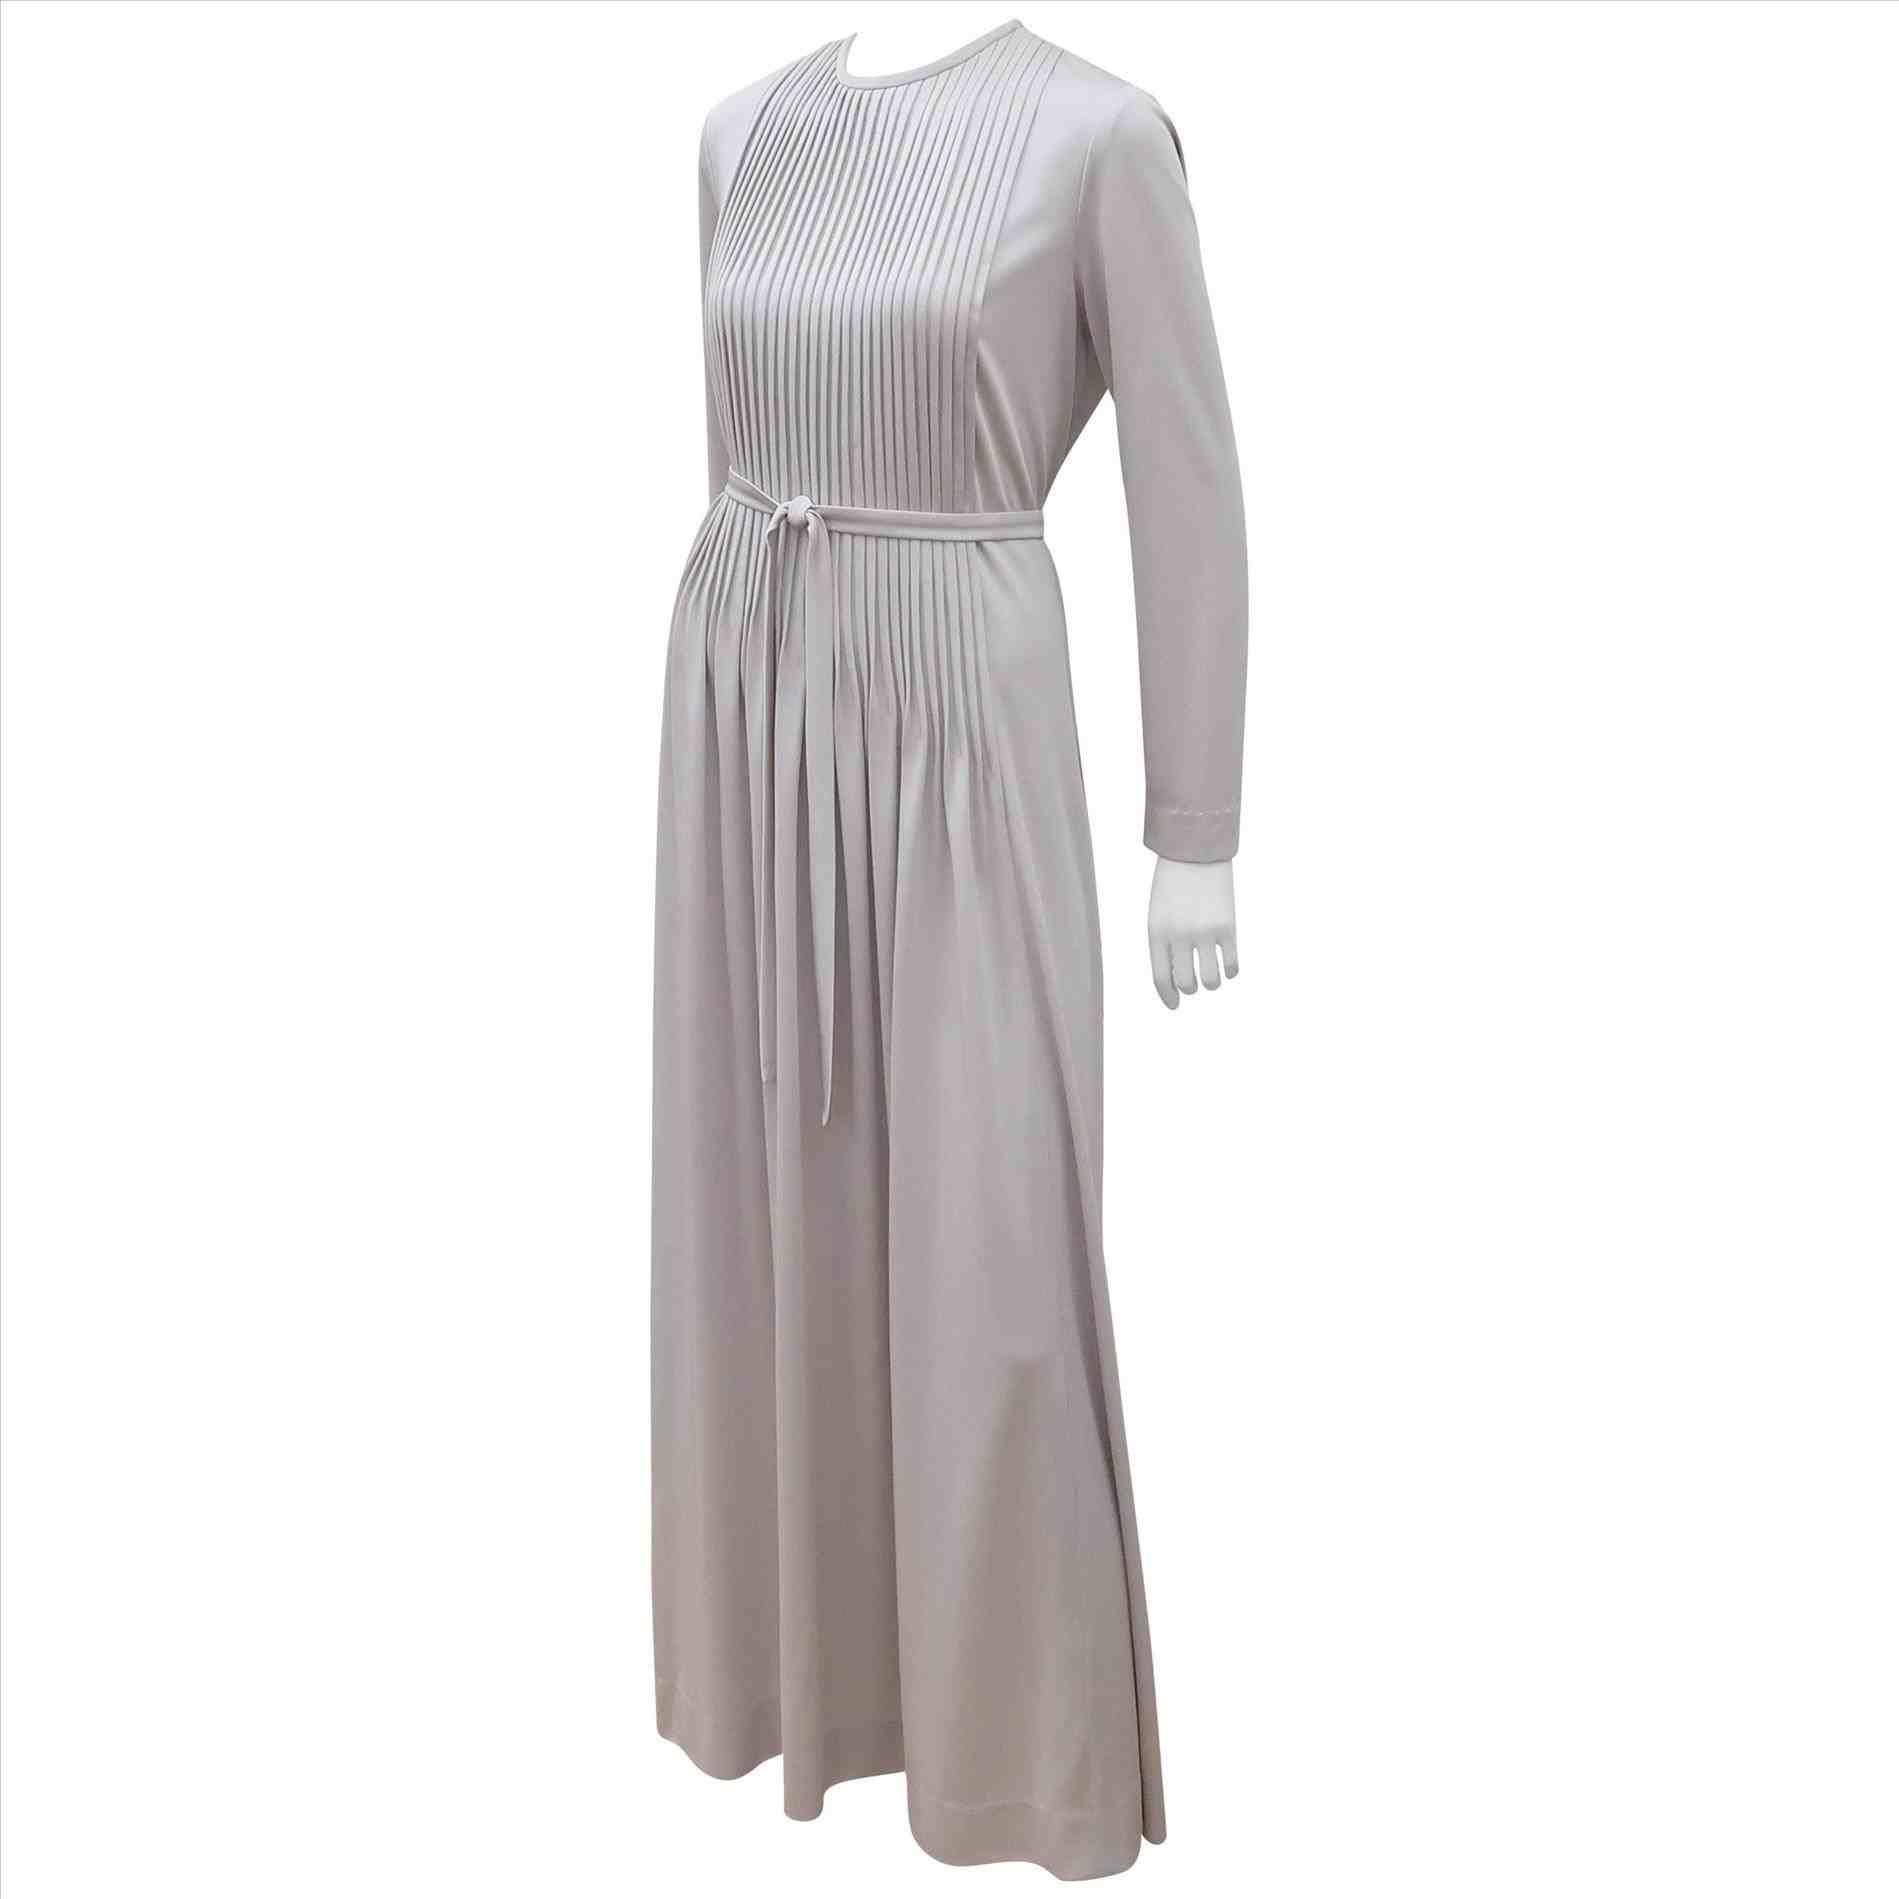 Party saks fifth avenue dresses avenue dresses fashion